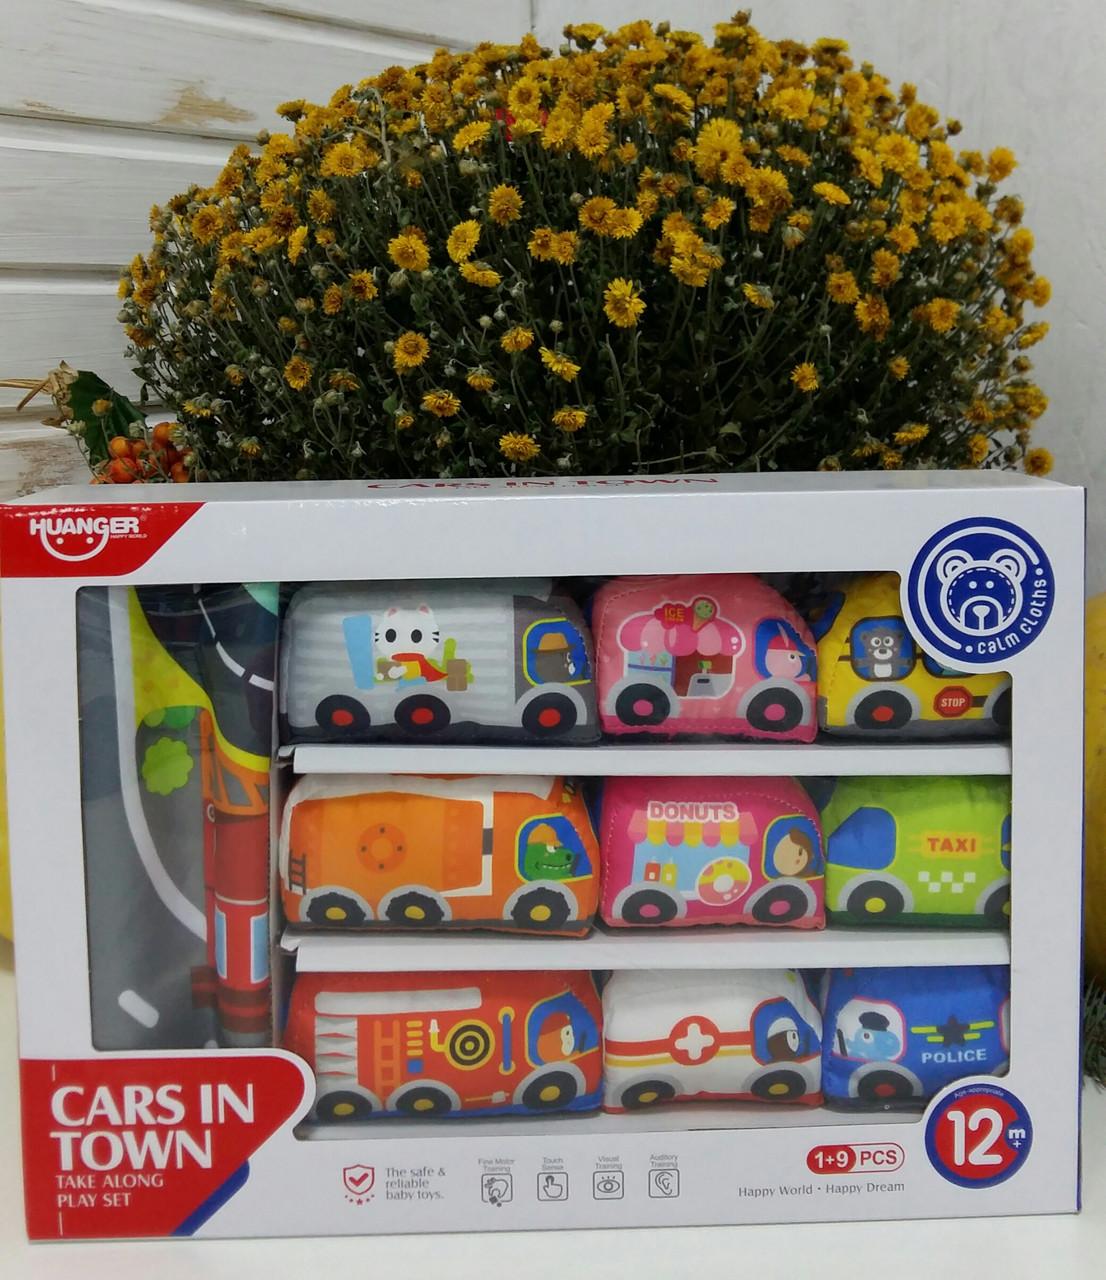 Набор мягких машинок + игровой коврик Huanger Cars in town HE0244